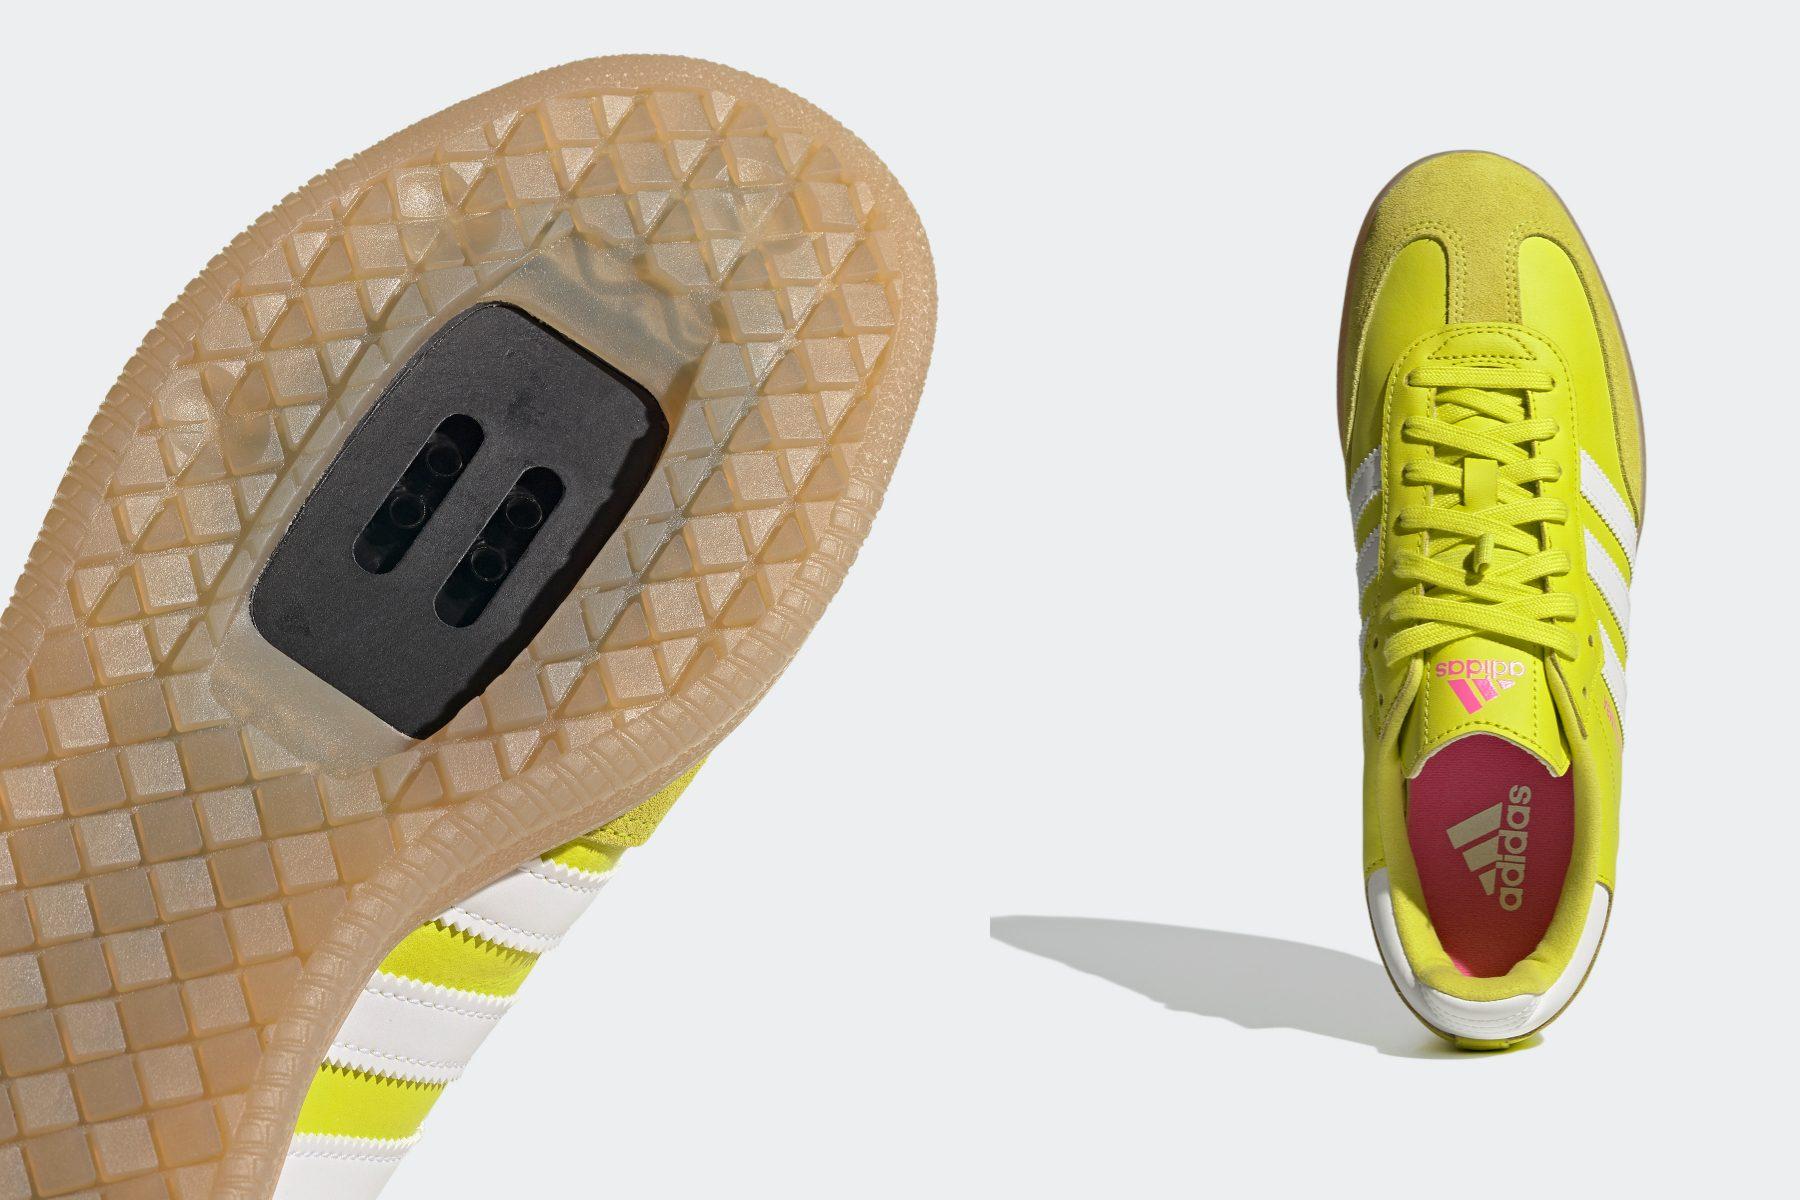 New 2021 Adidas Velosamba clip-in urban shoe released - BikeRadar